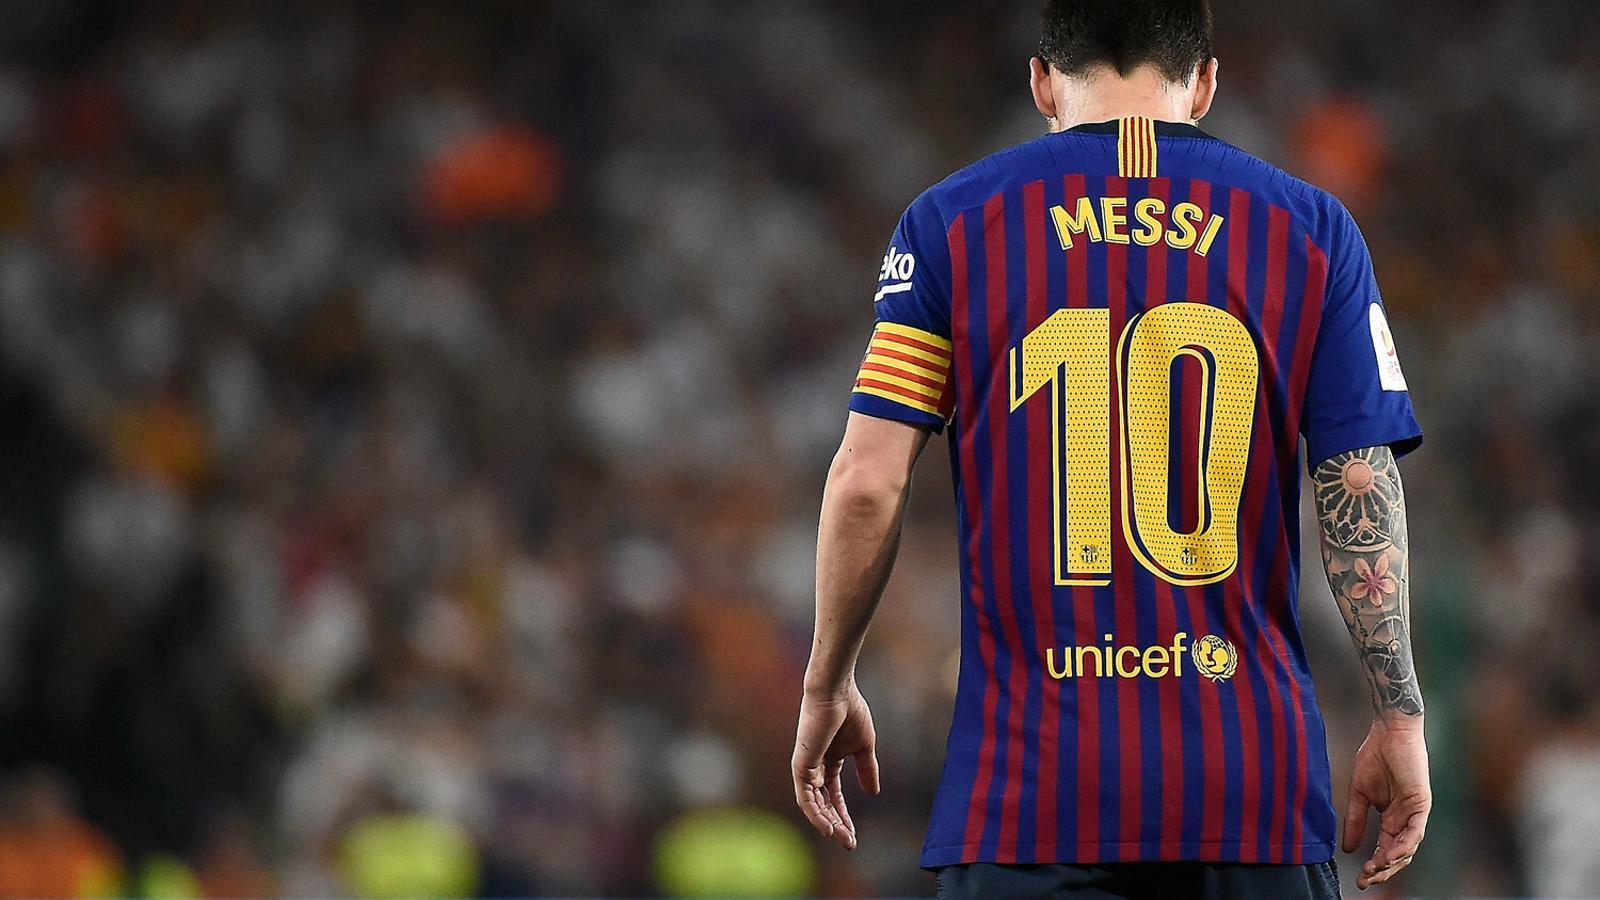 La soledat de  Lionel Messi